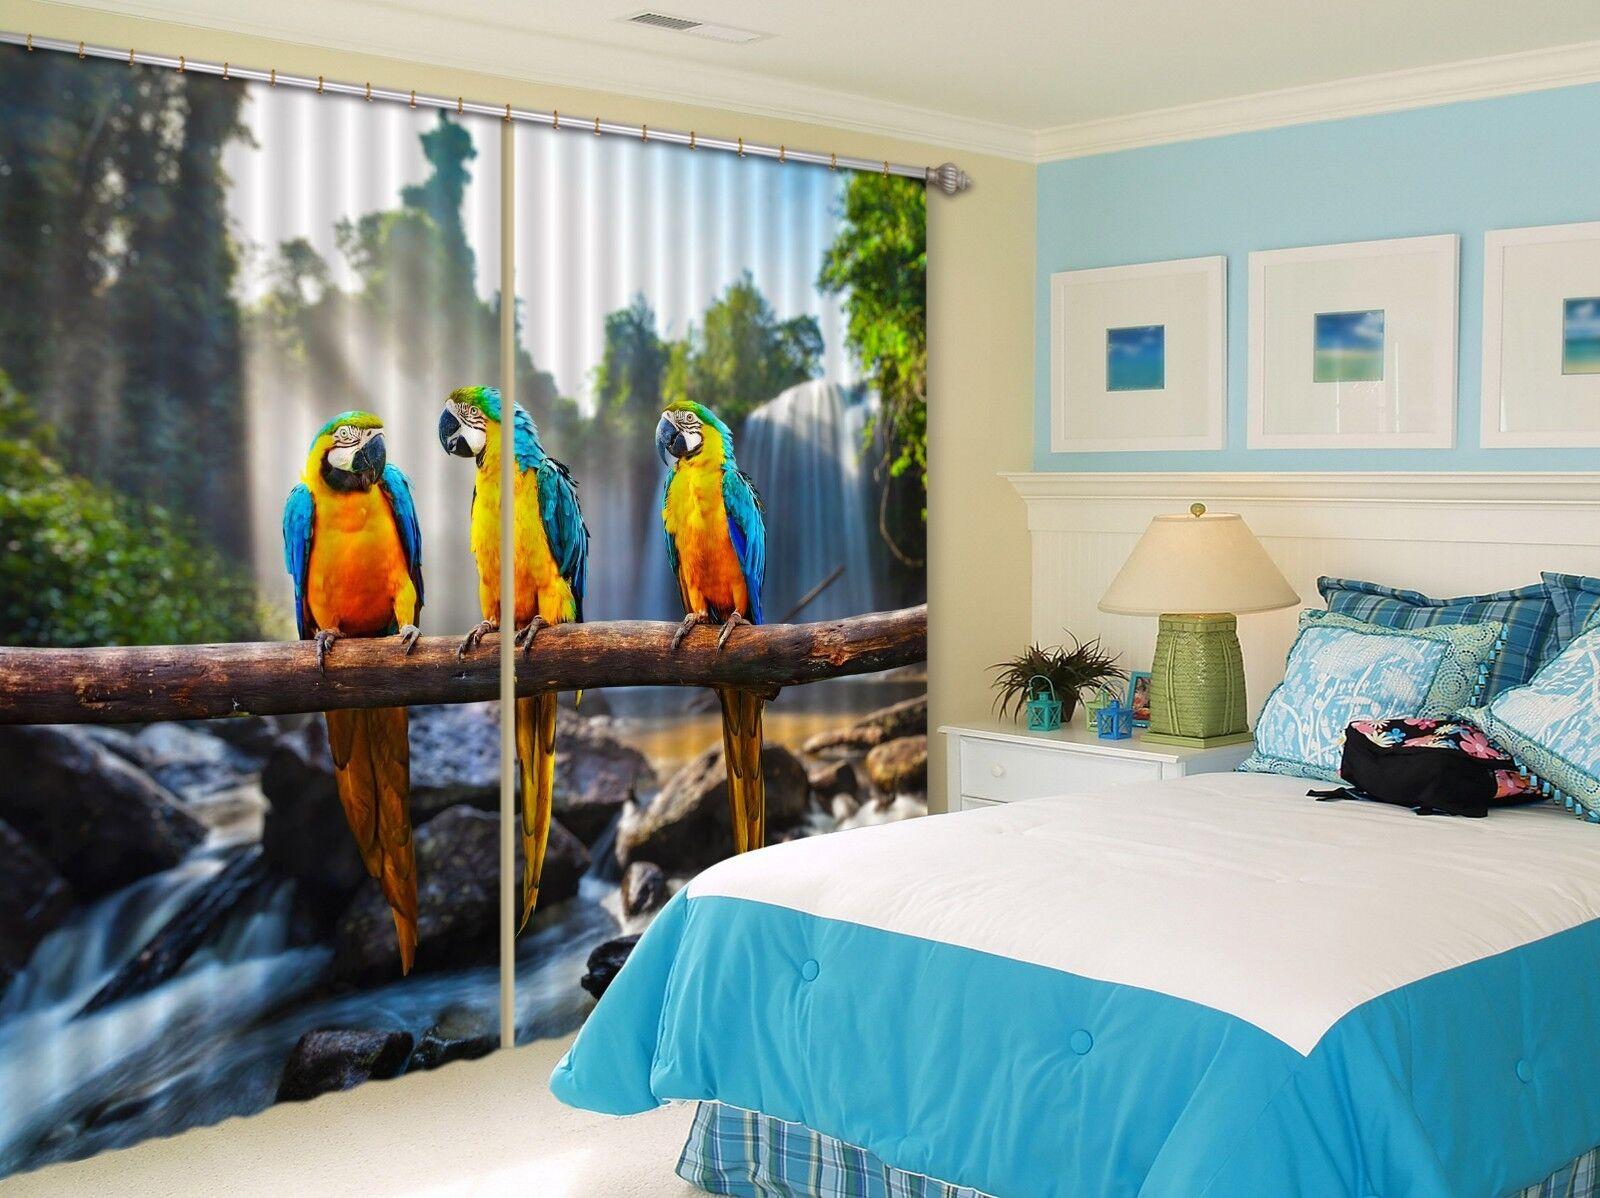 3D Loro Sky 7 Cortinas de impresión de cortina de foto Blockout Tela Cortinas Ventana au